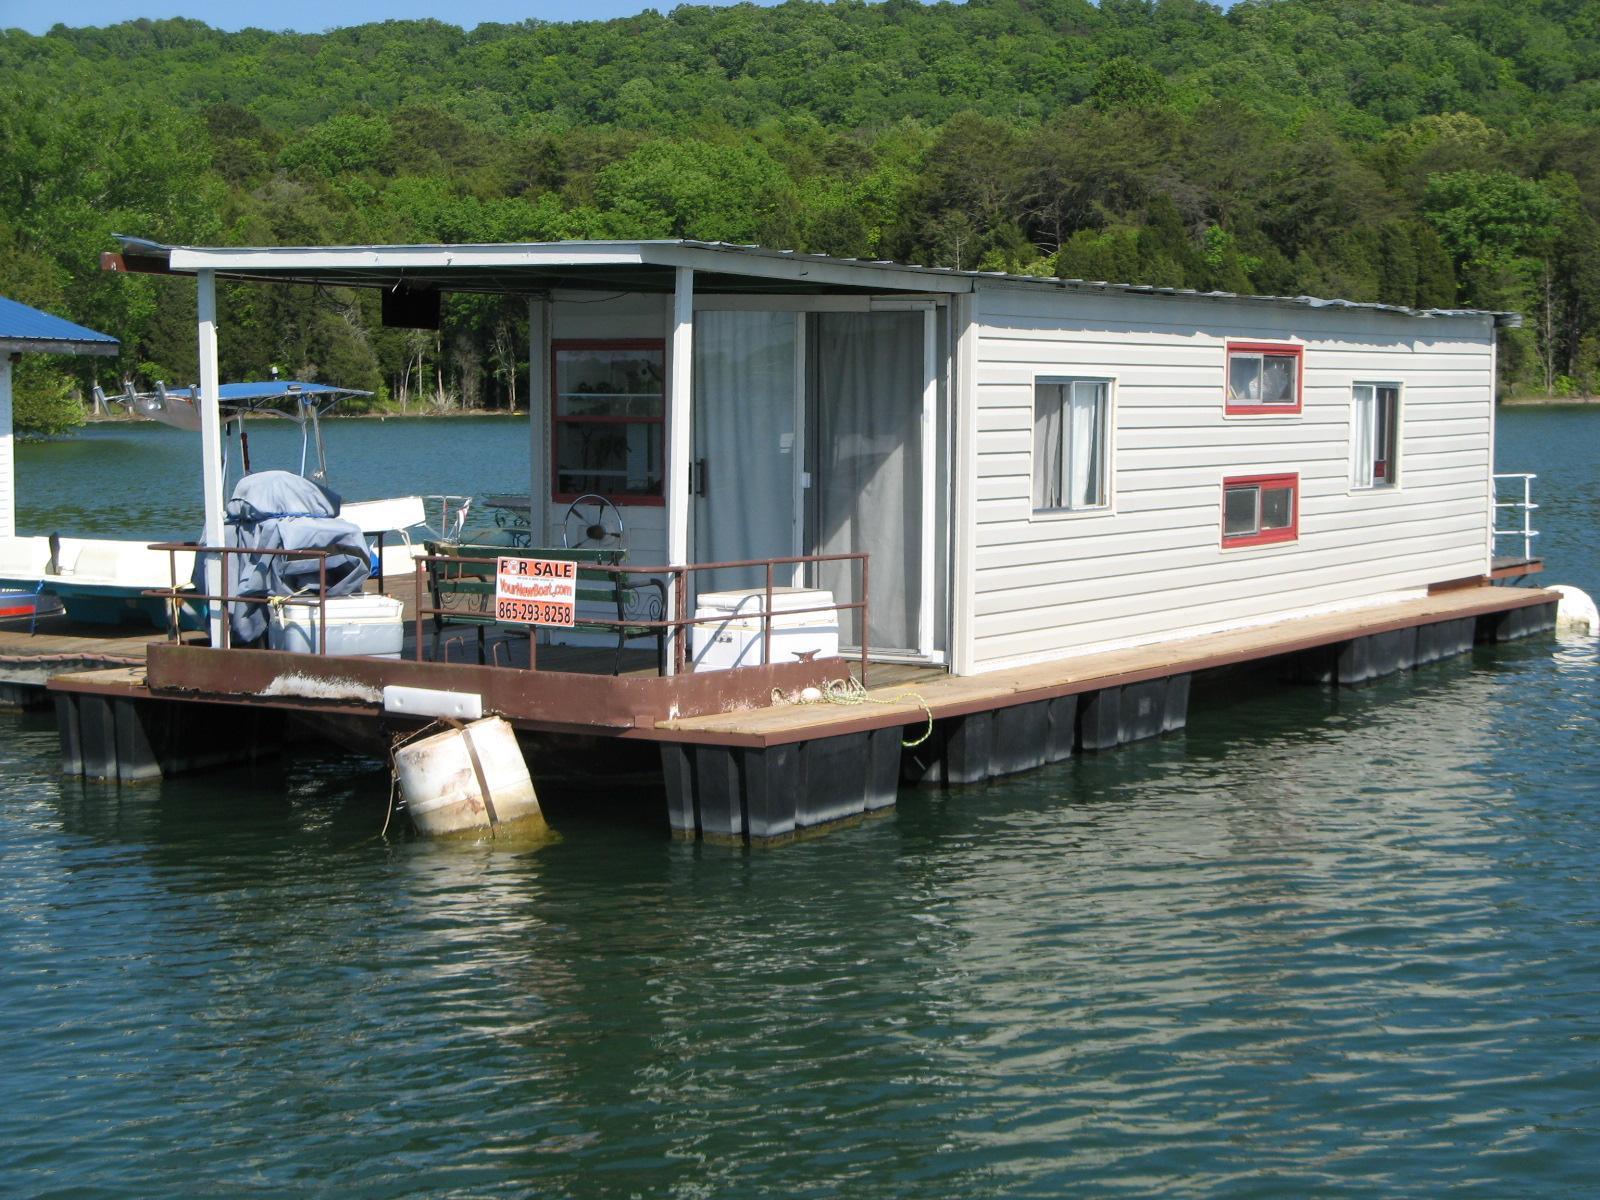 custom built 16 x 32 floating home  norris lake  tn images Floating Home Lake Norris Rentals Norris Lake Floating Houses for Rent